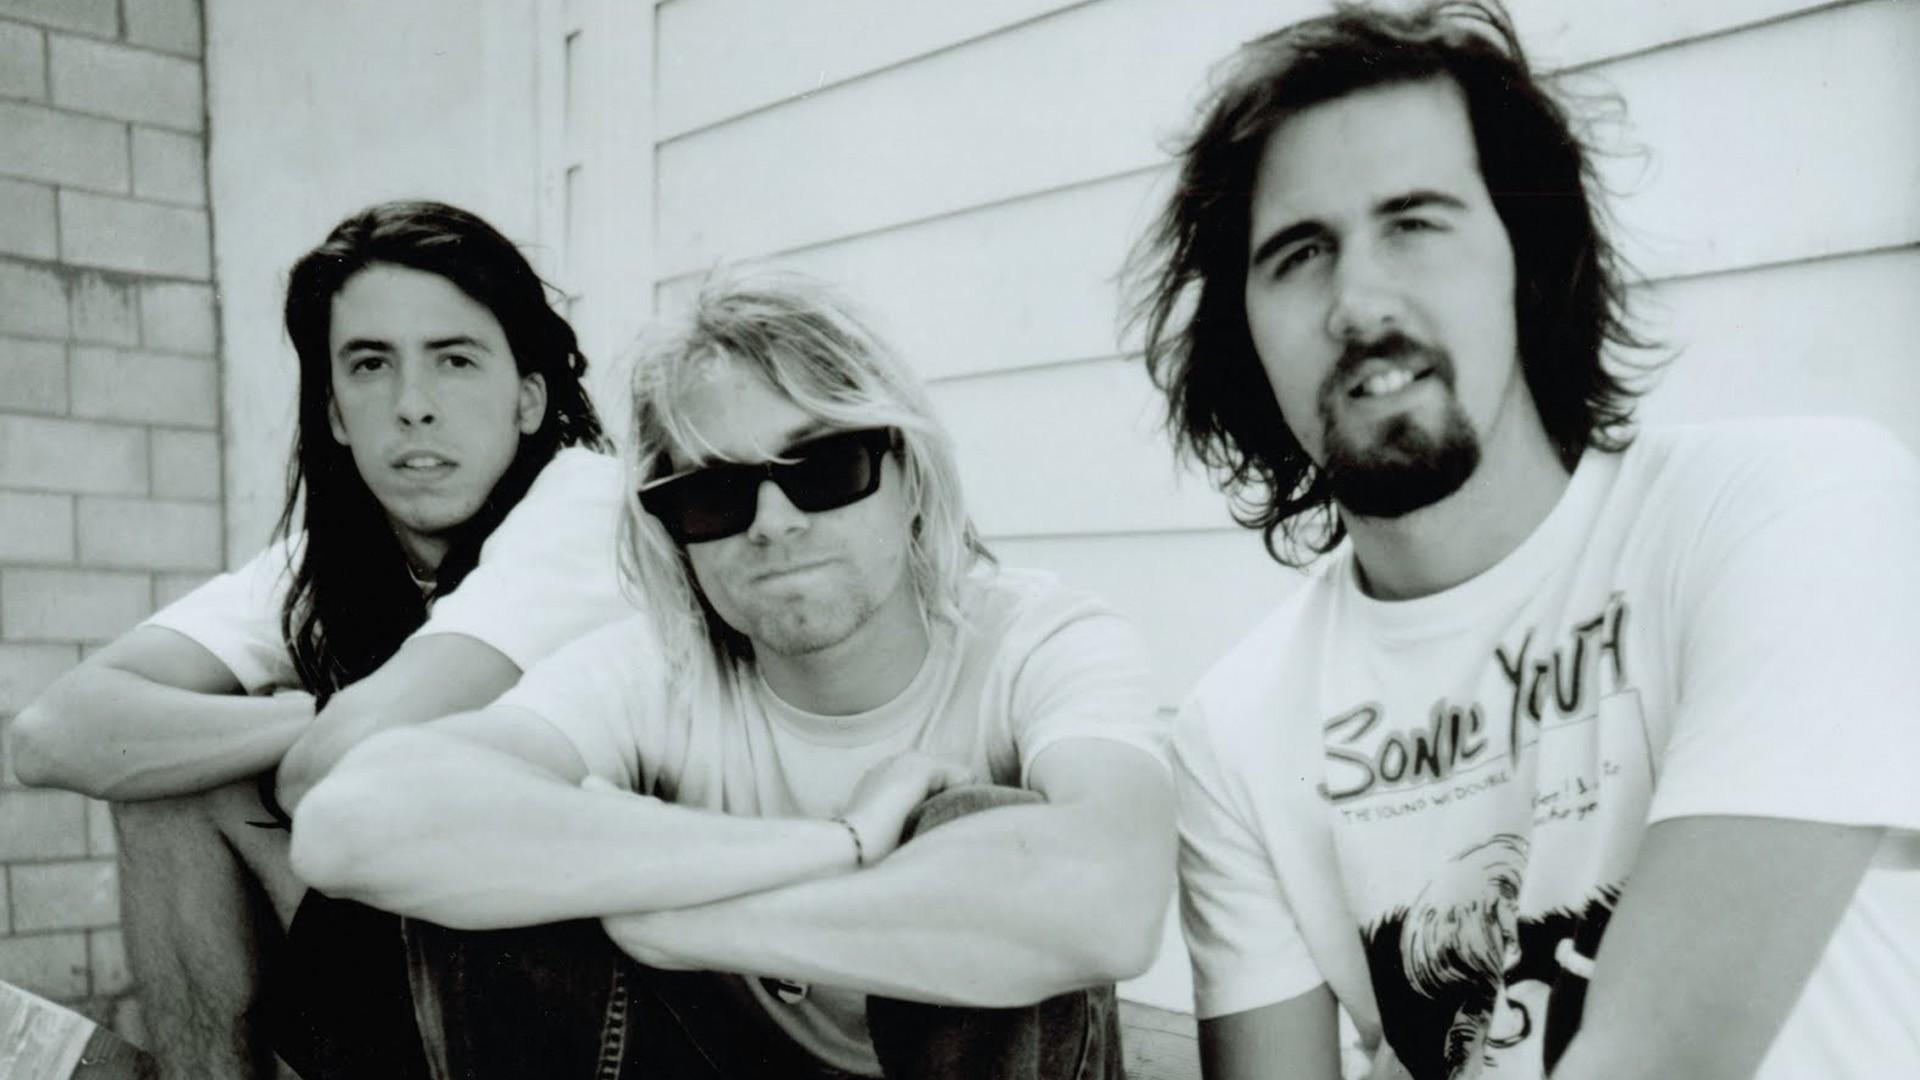 Nirvana Sonic Youth Shirt Wallpaper